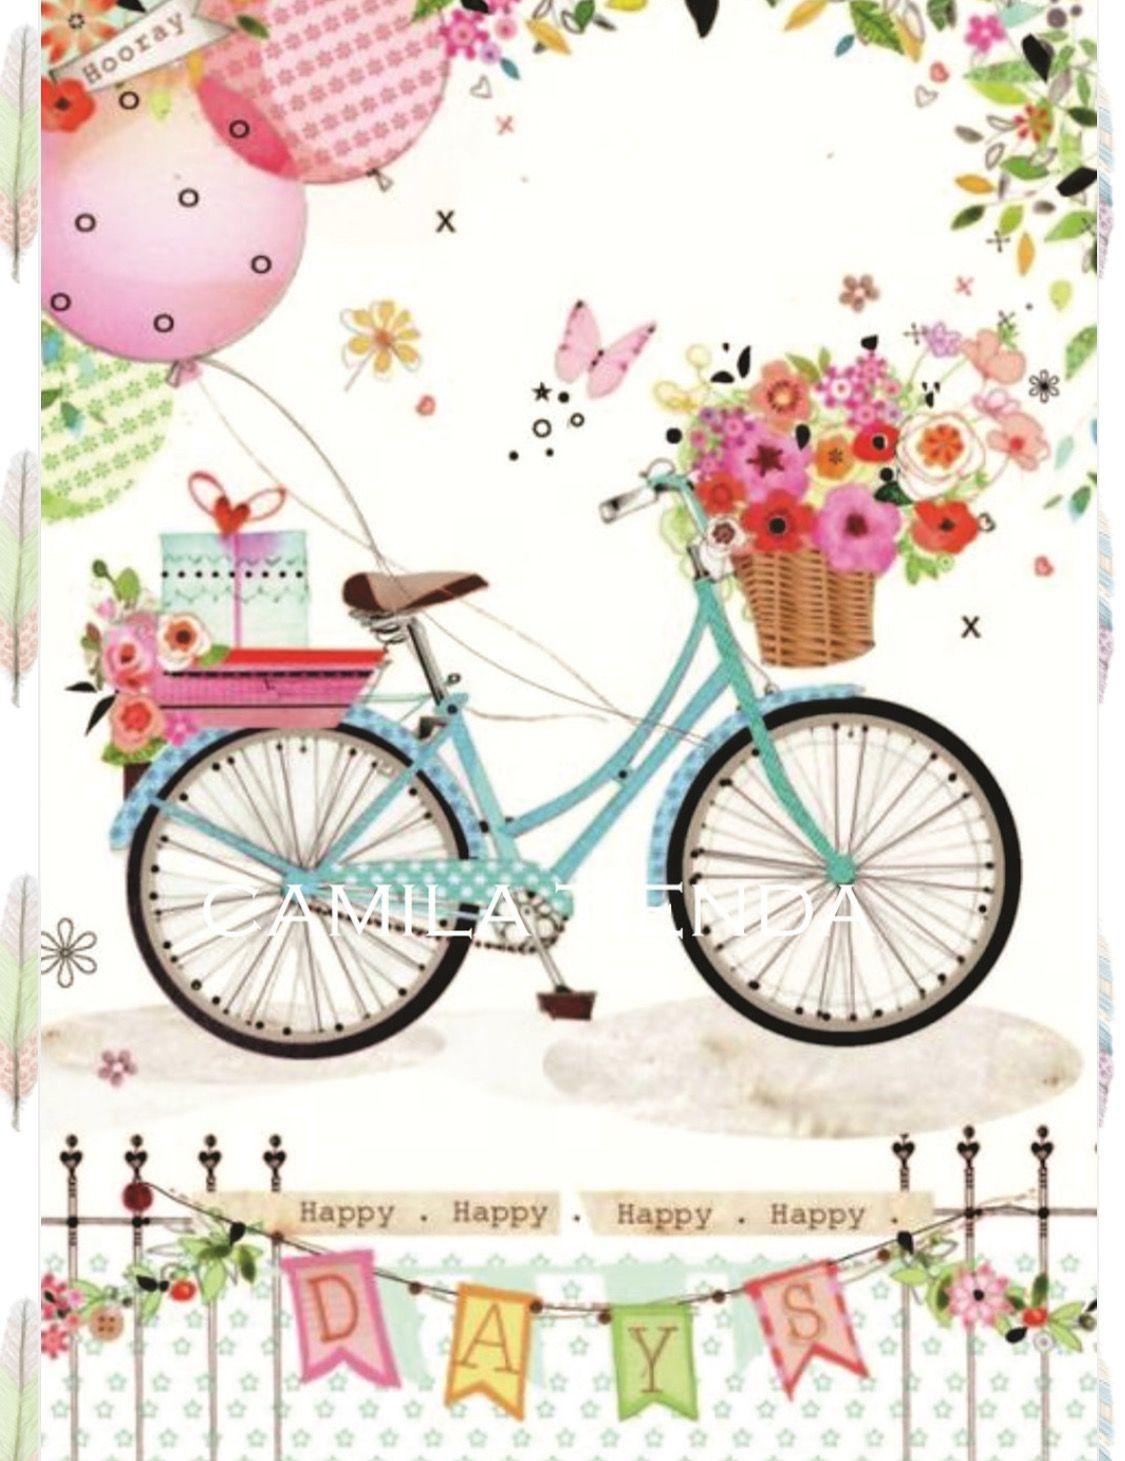 Pin by aglar on. Bike clipart birthday